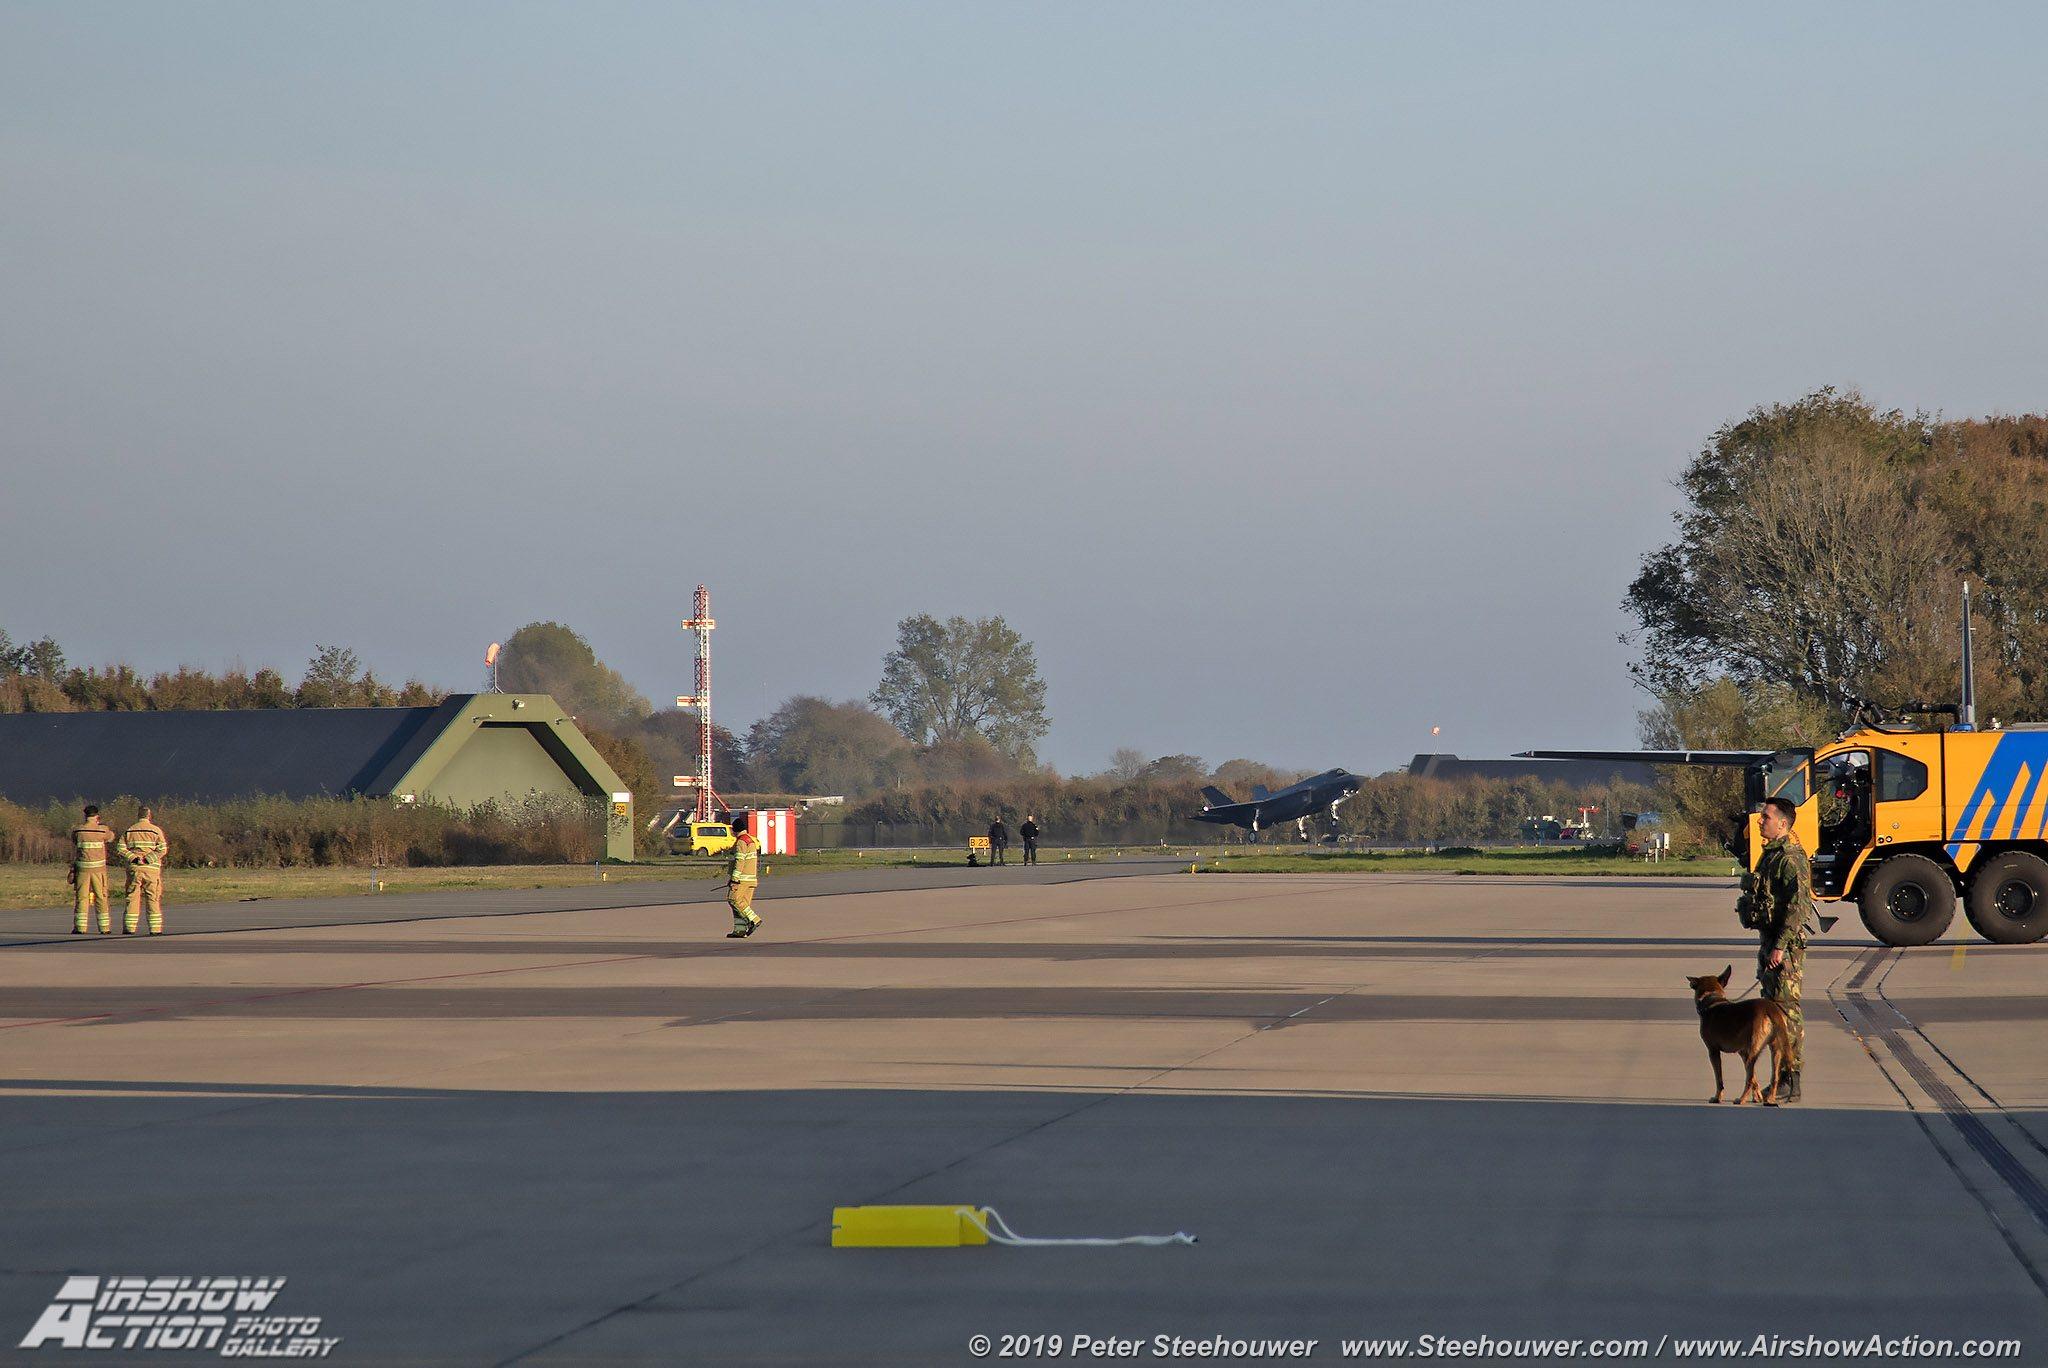 f35_arrival19_014.jpg